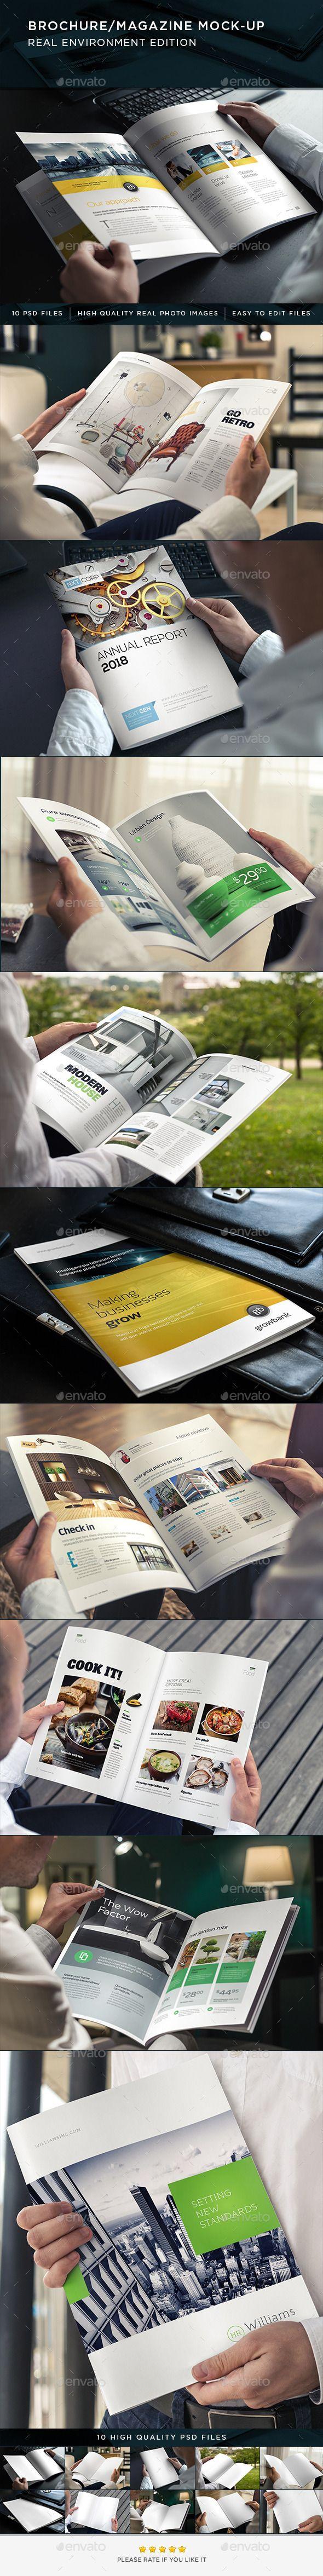 Brochure / Magazine Mock-Up | #brochuremockup #magazinemockup #mockup | Download: http://graphicriver.net/item/brochure-magazine-mockup/8836441?ref=ksioks